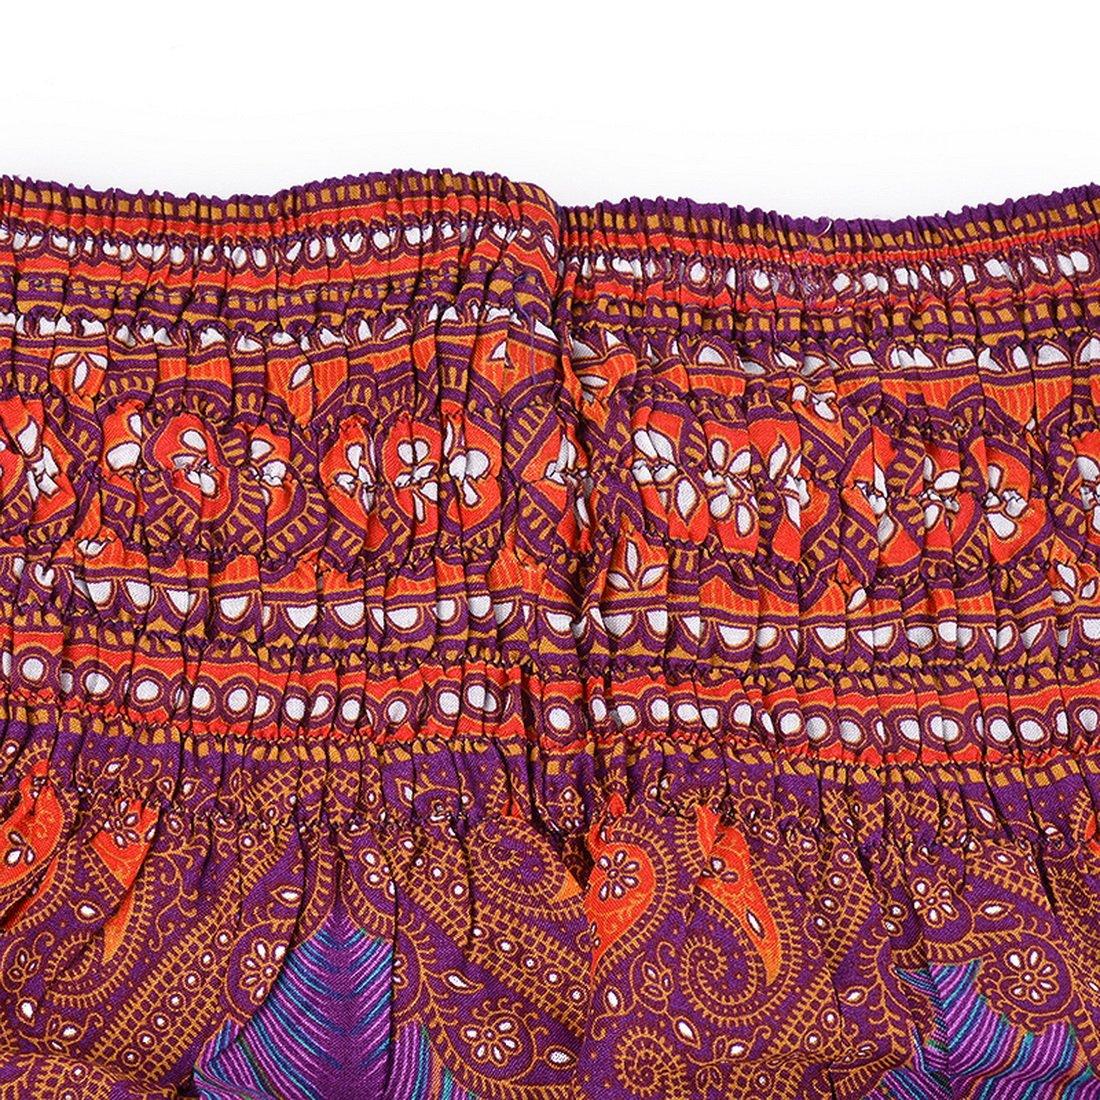 Shujin Damen Hippie Hose Boho Harem-Stil Pumphose Haremshose mit Pfauendruck Blumenmuster Pluderhose Sommerhose Yoga Pants Aladin Freizeithose mit Taschen